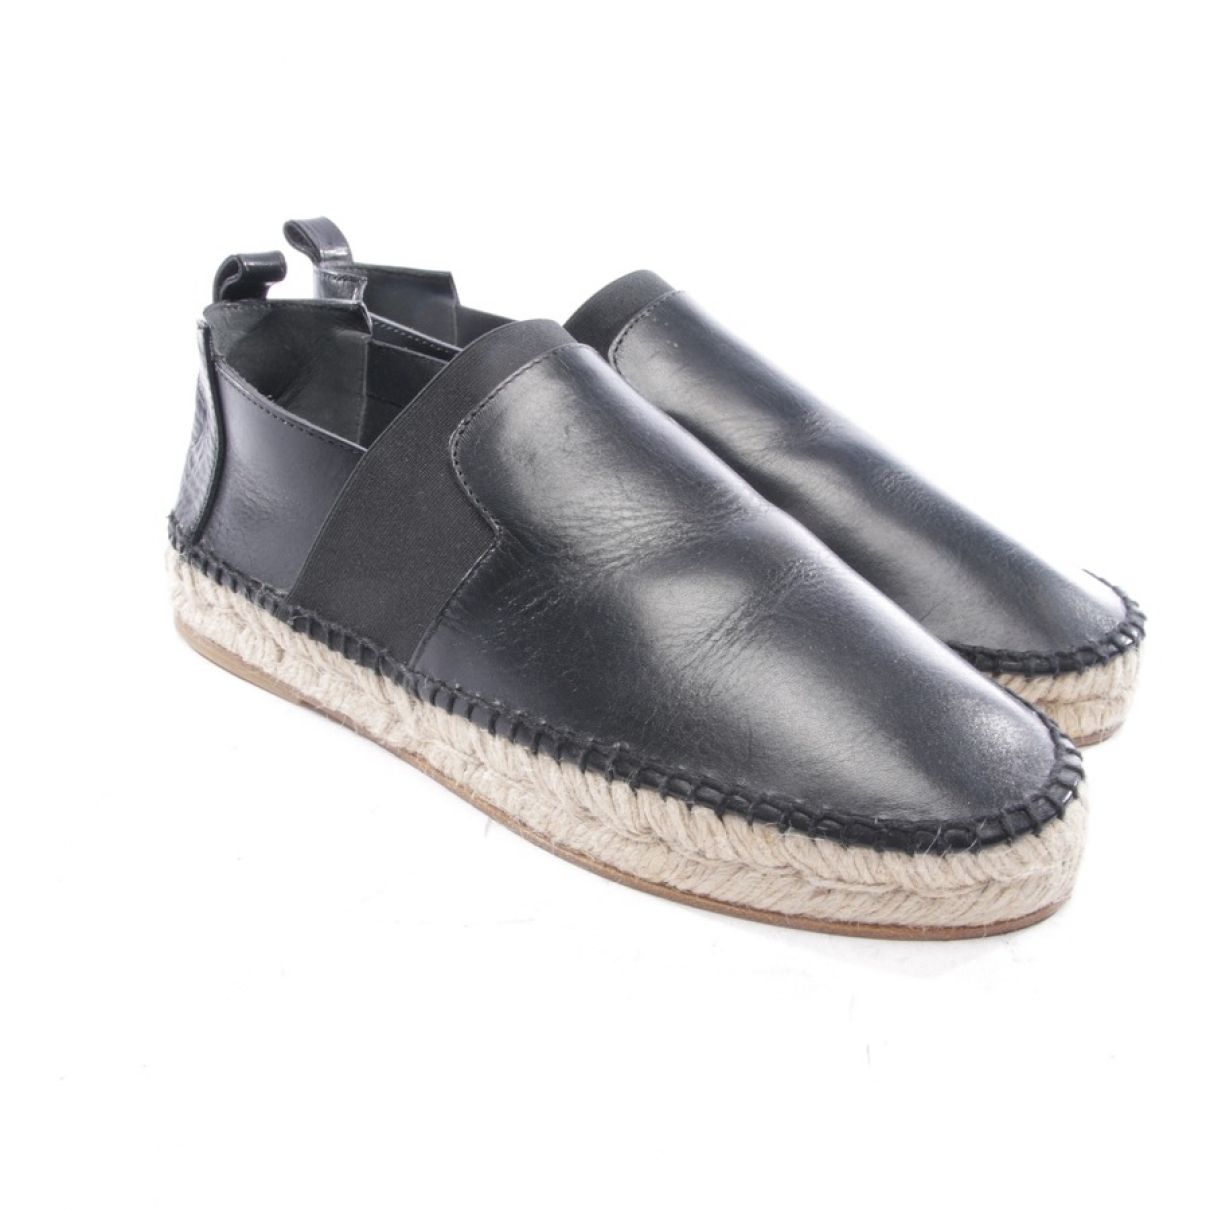 Balenciaga - Espadrilles   pour homme en cuir - noir